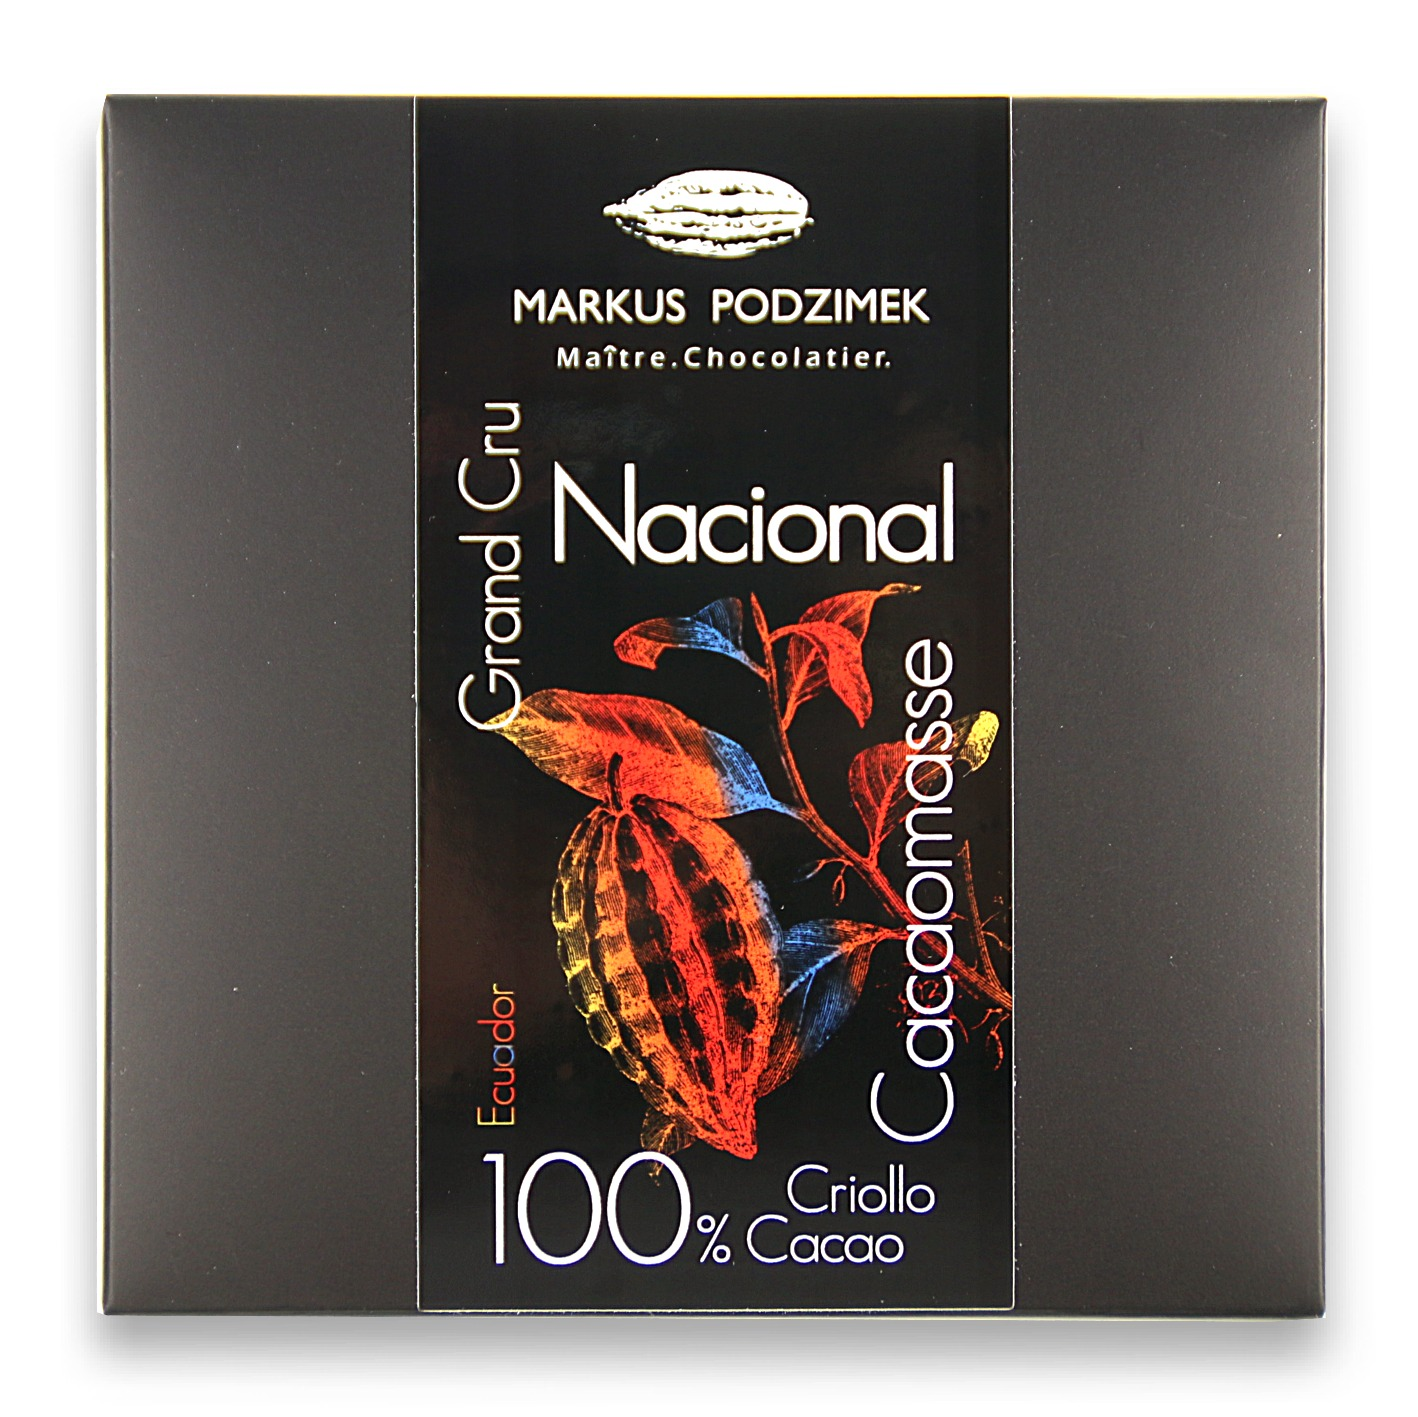 NacionalGrandCruEdel-Kakaomasse100-1.jpg